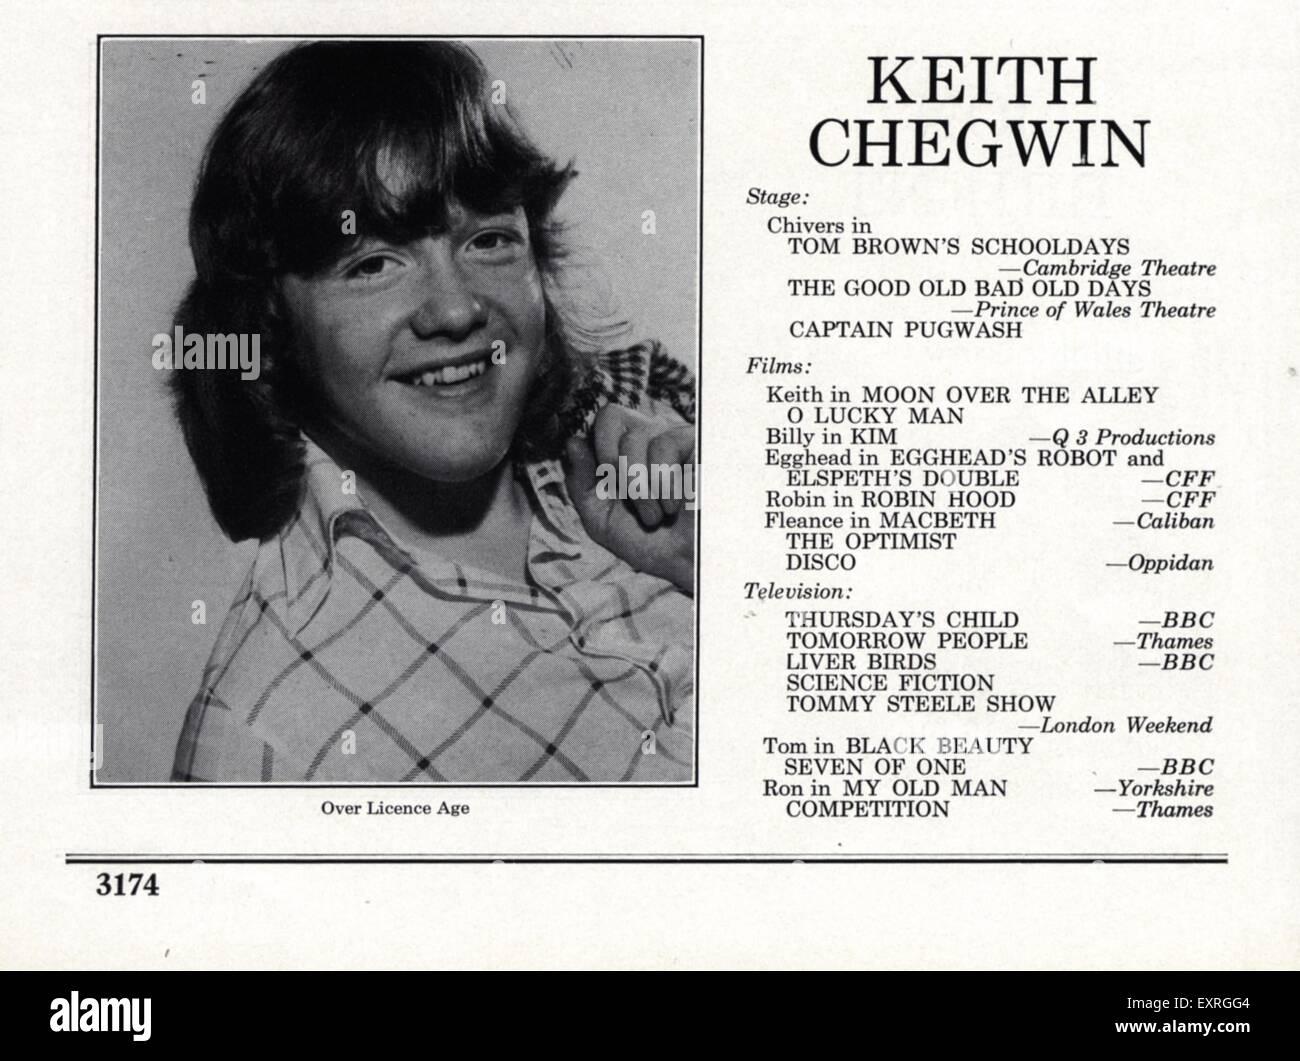 1970s Uk Stage School Resume Imágenes De Stock & 1970s Uk Stage ...